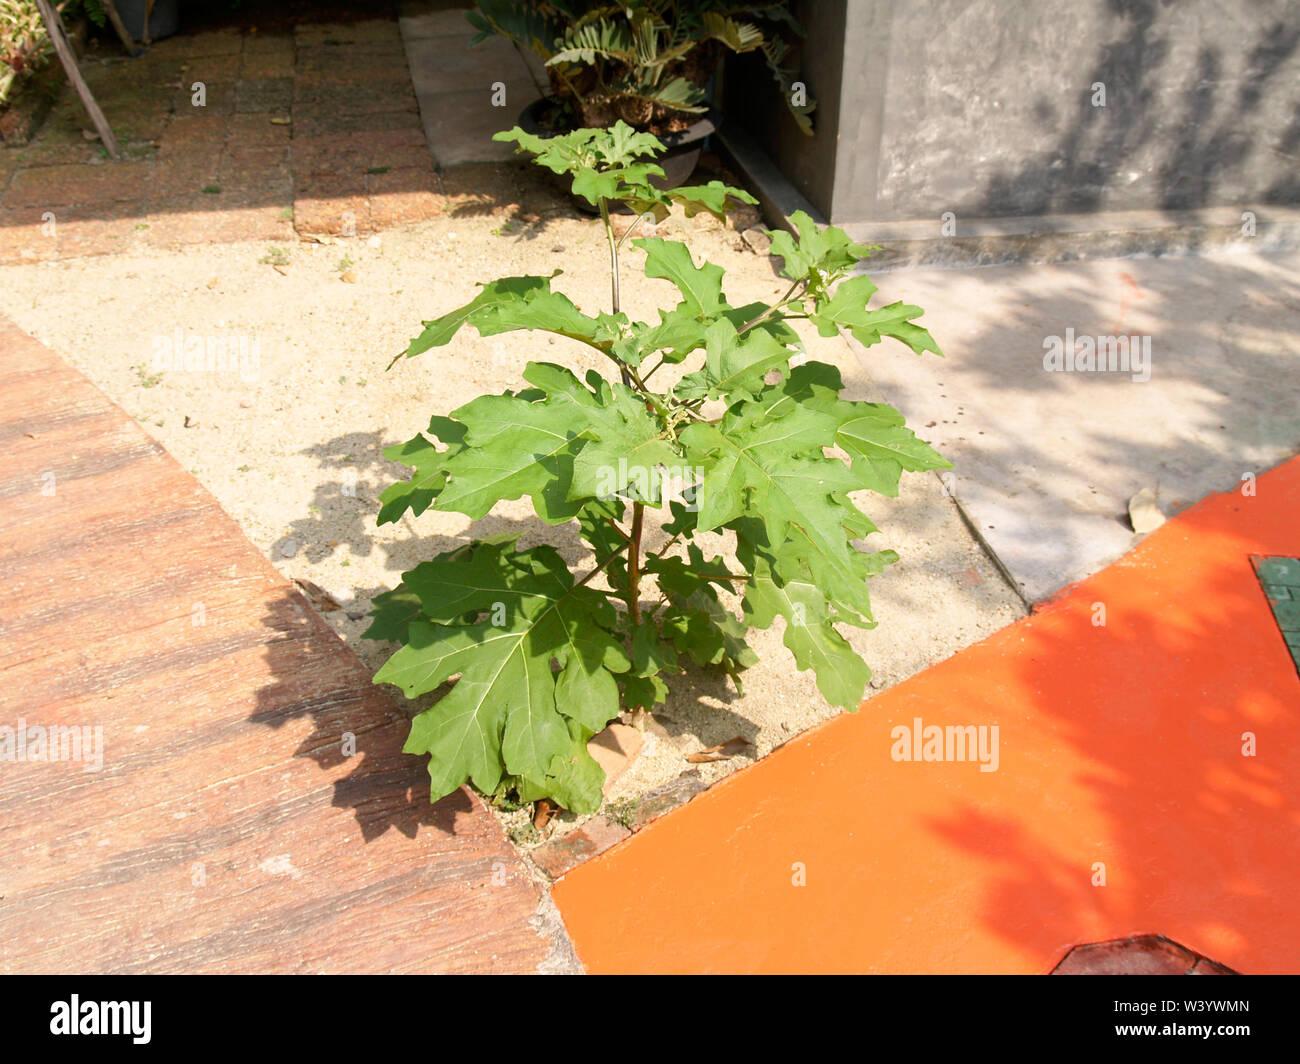 The Solanum torvum is growing Beside the walkway - Stock Image